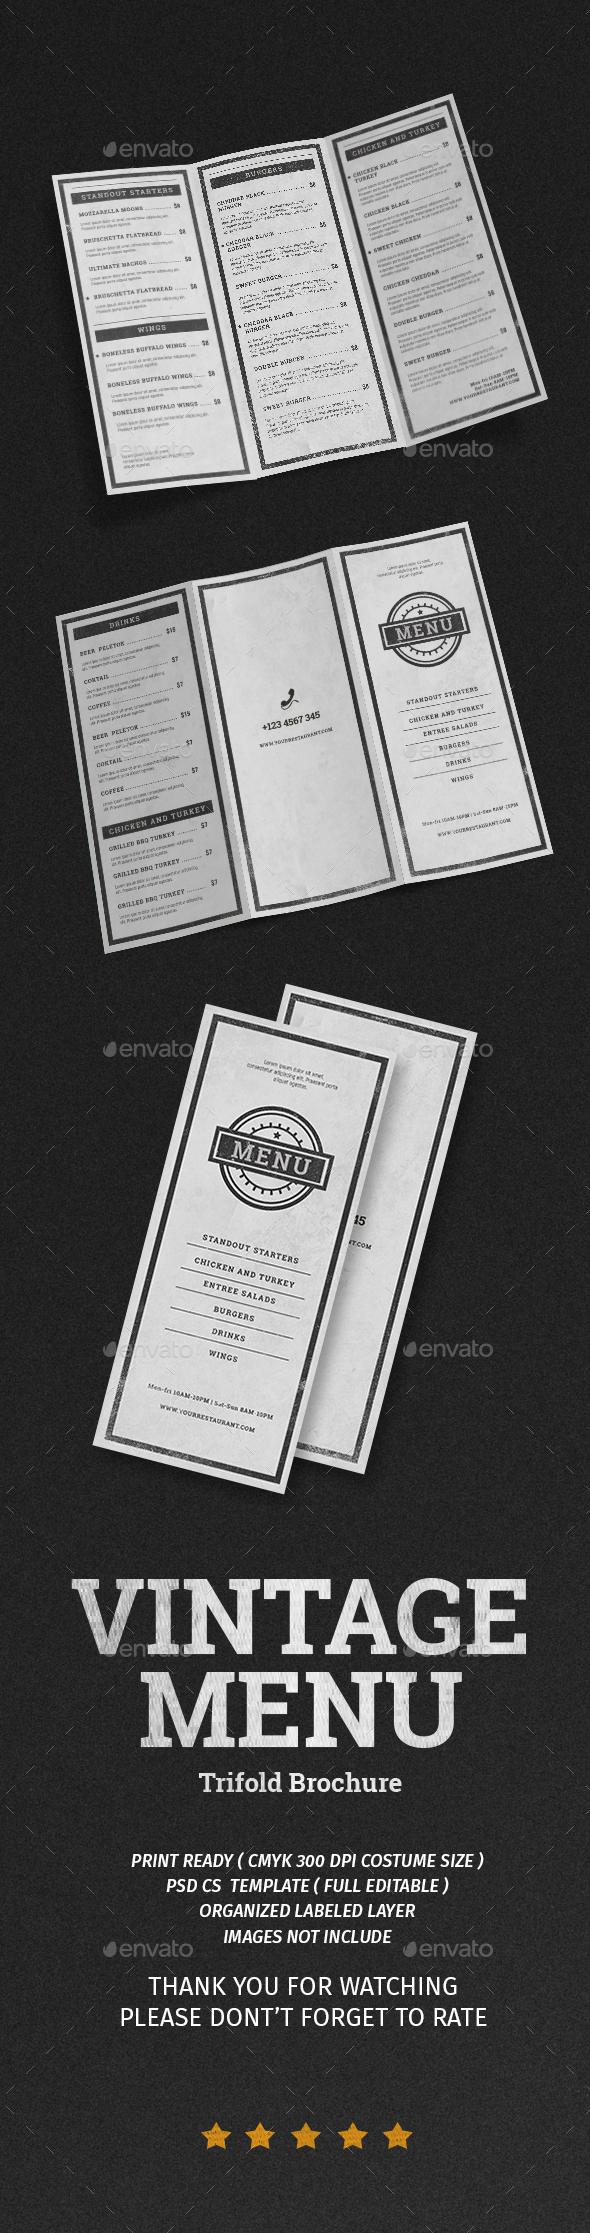 Vintage Menu Trifold Brochure - Restaurant Flyers